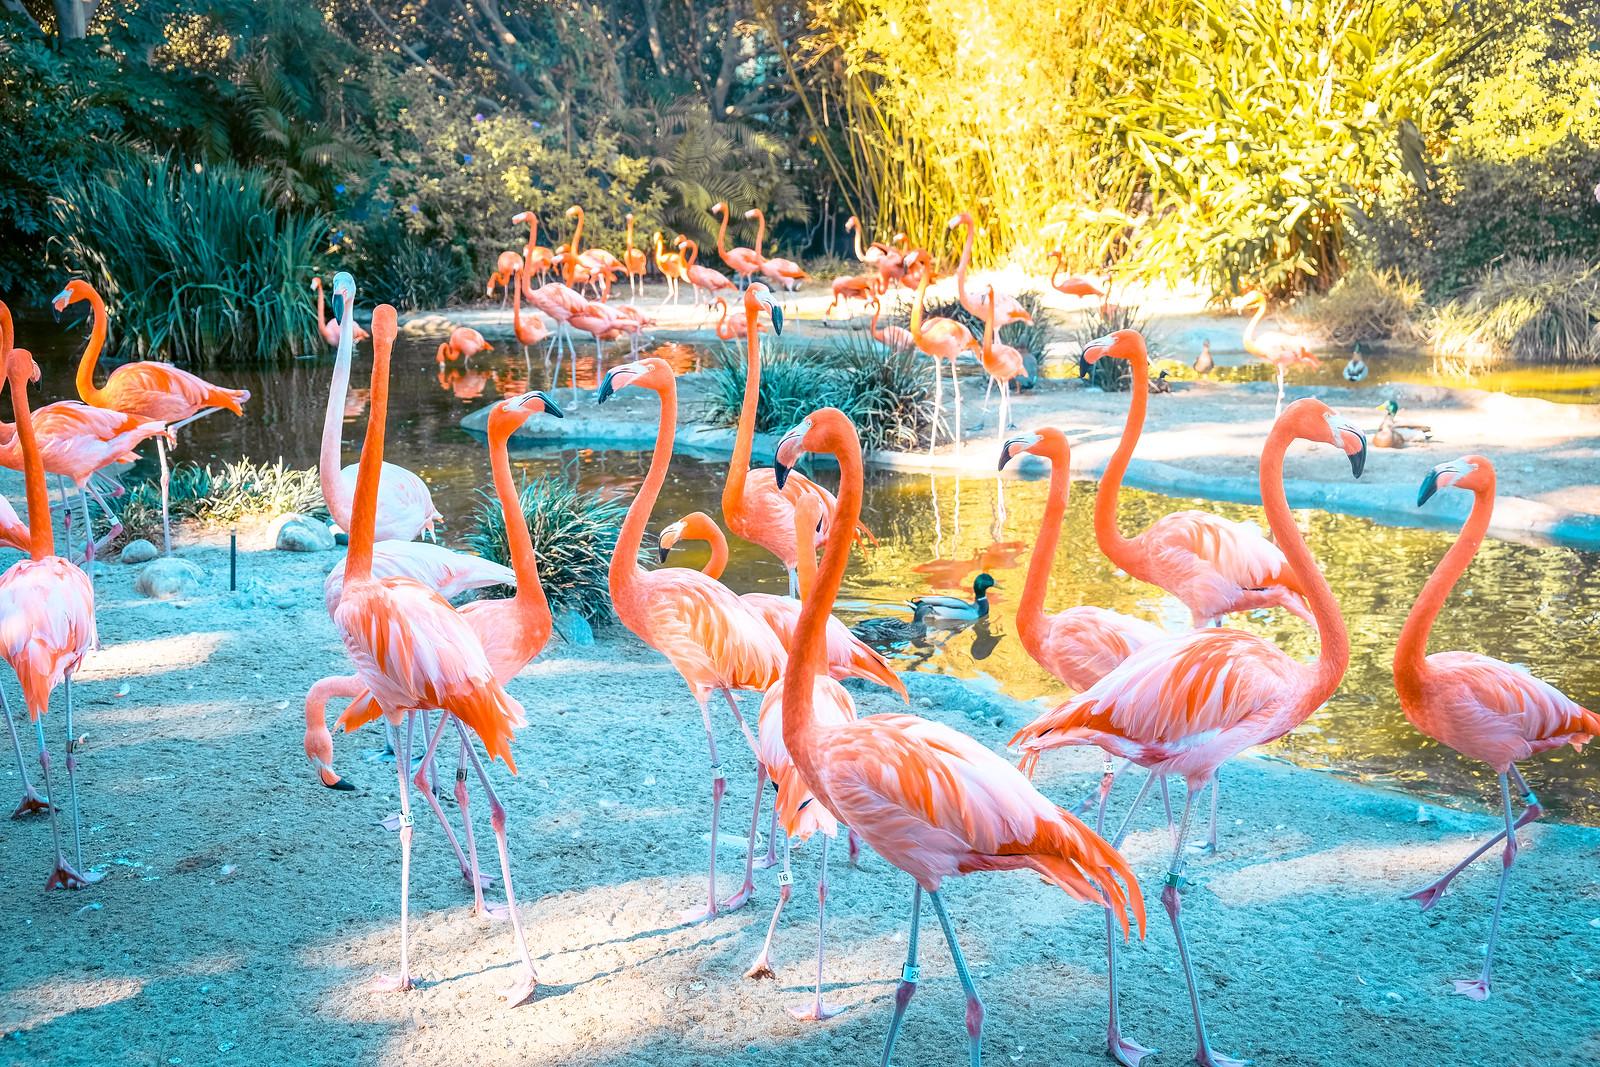 San Diego Zoo Flamingos | One Day in San Diego Itinerary